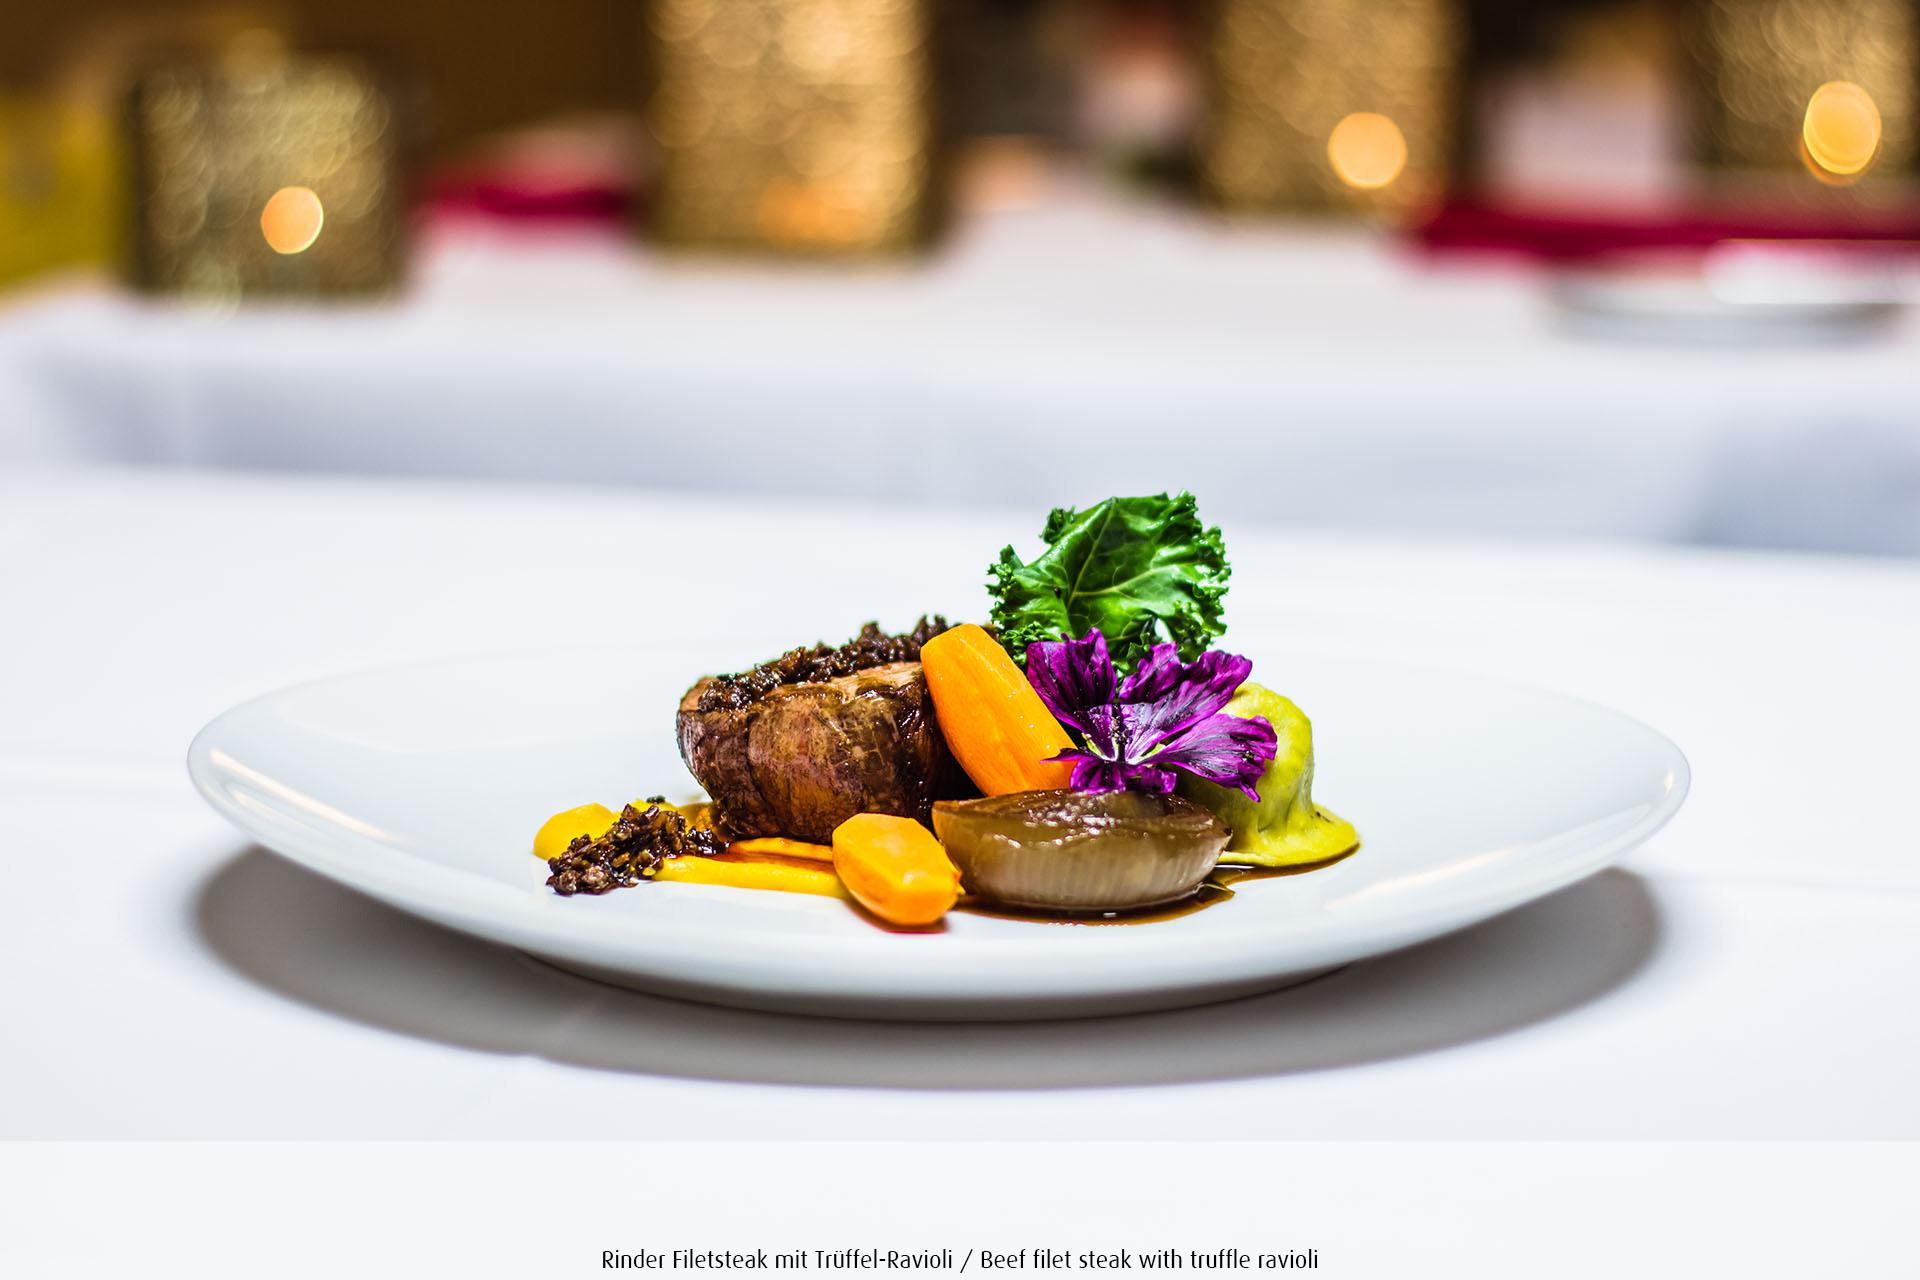 Rinder-Filetsteak mit Trüffel Ravioli